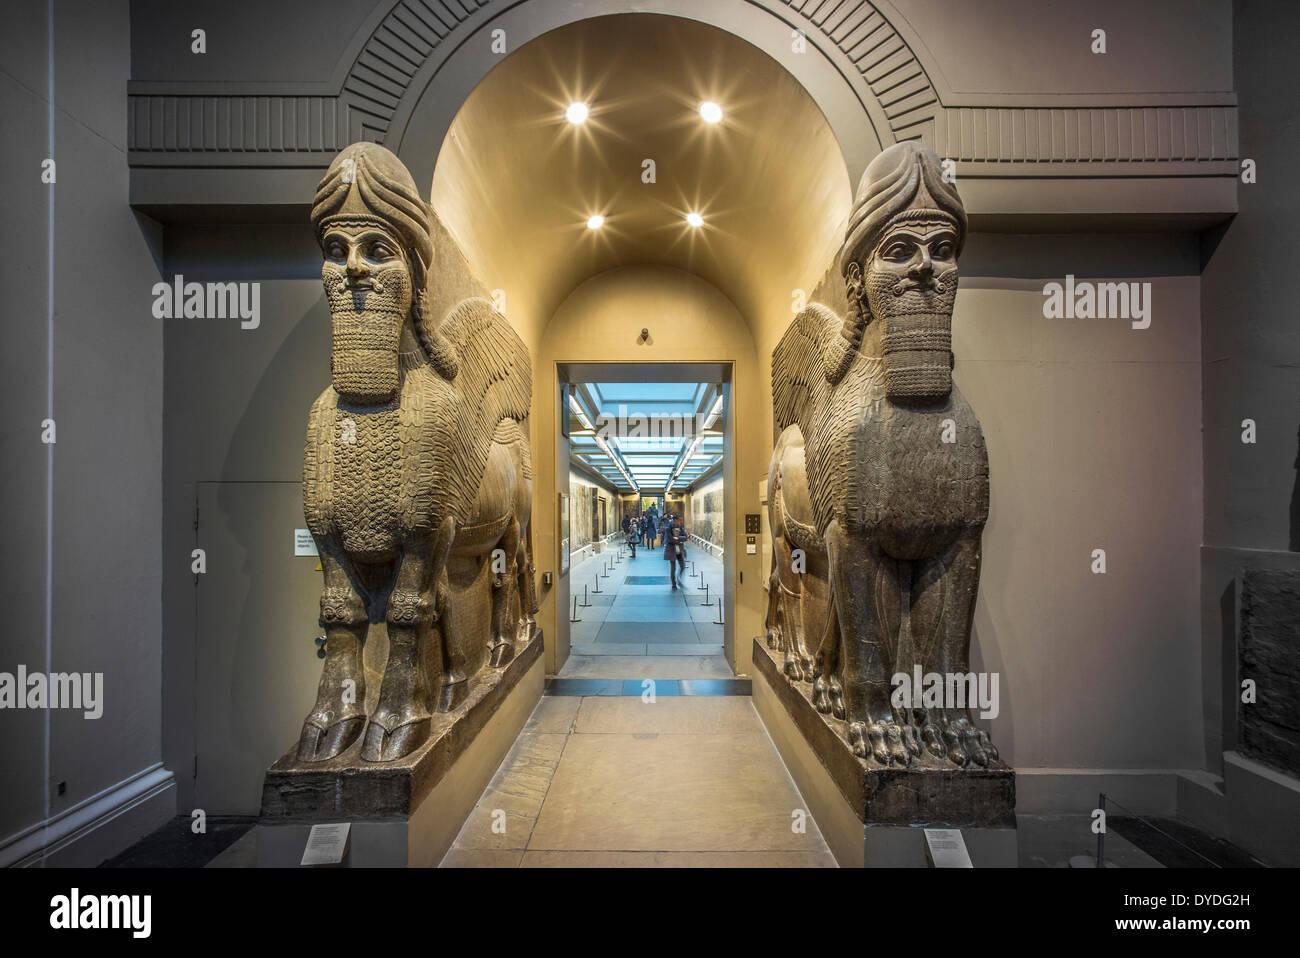 Ägyptologie im British Museum. Stockbild